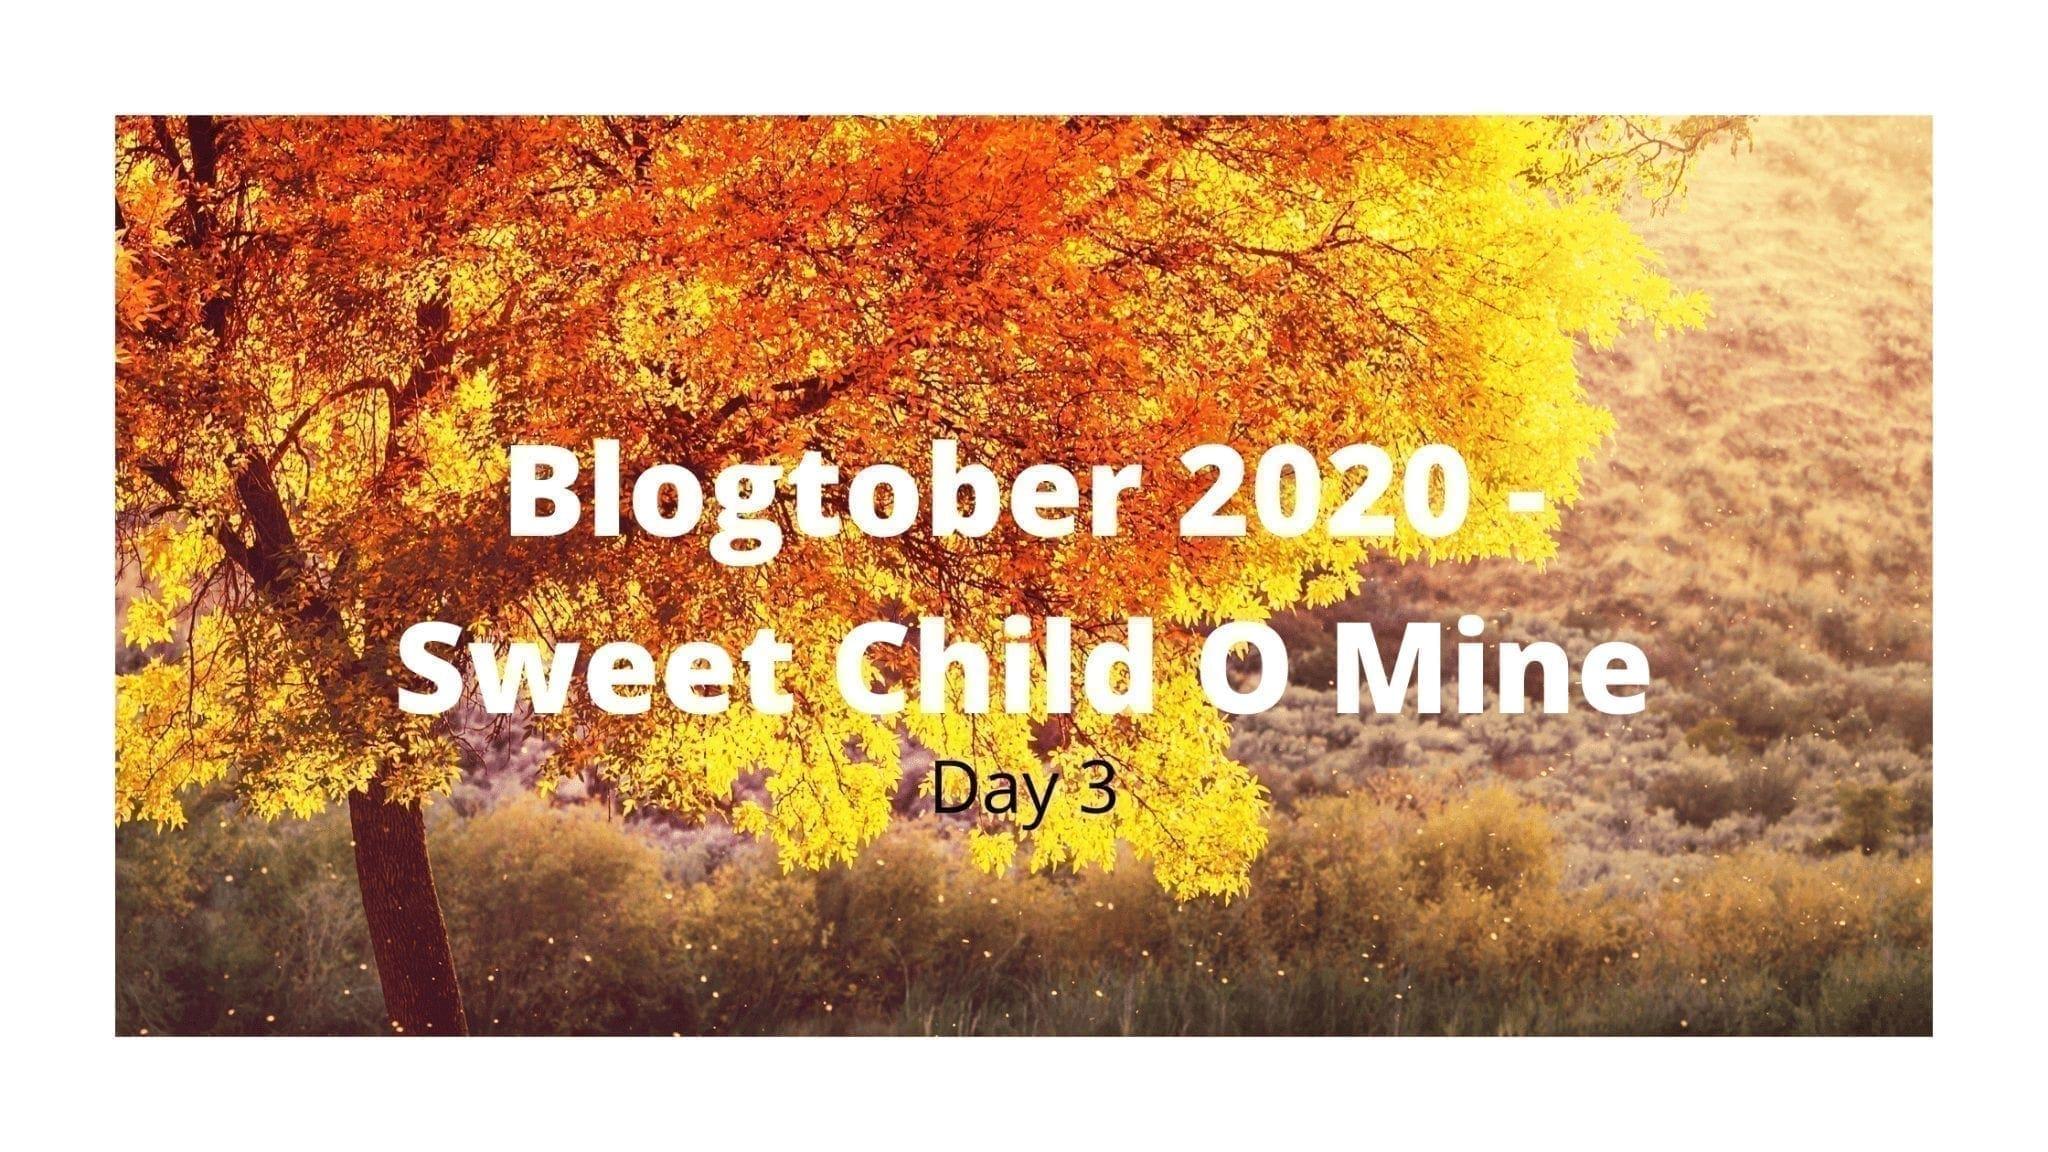 Blogtober 2020 - Sweet Child O Mine